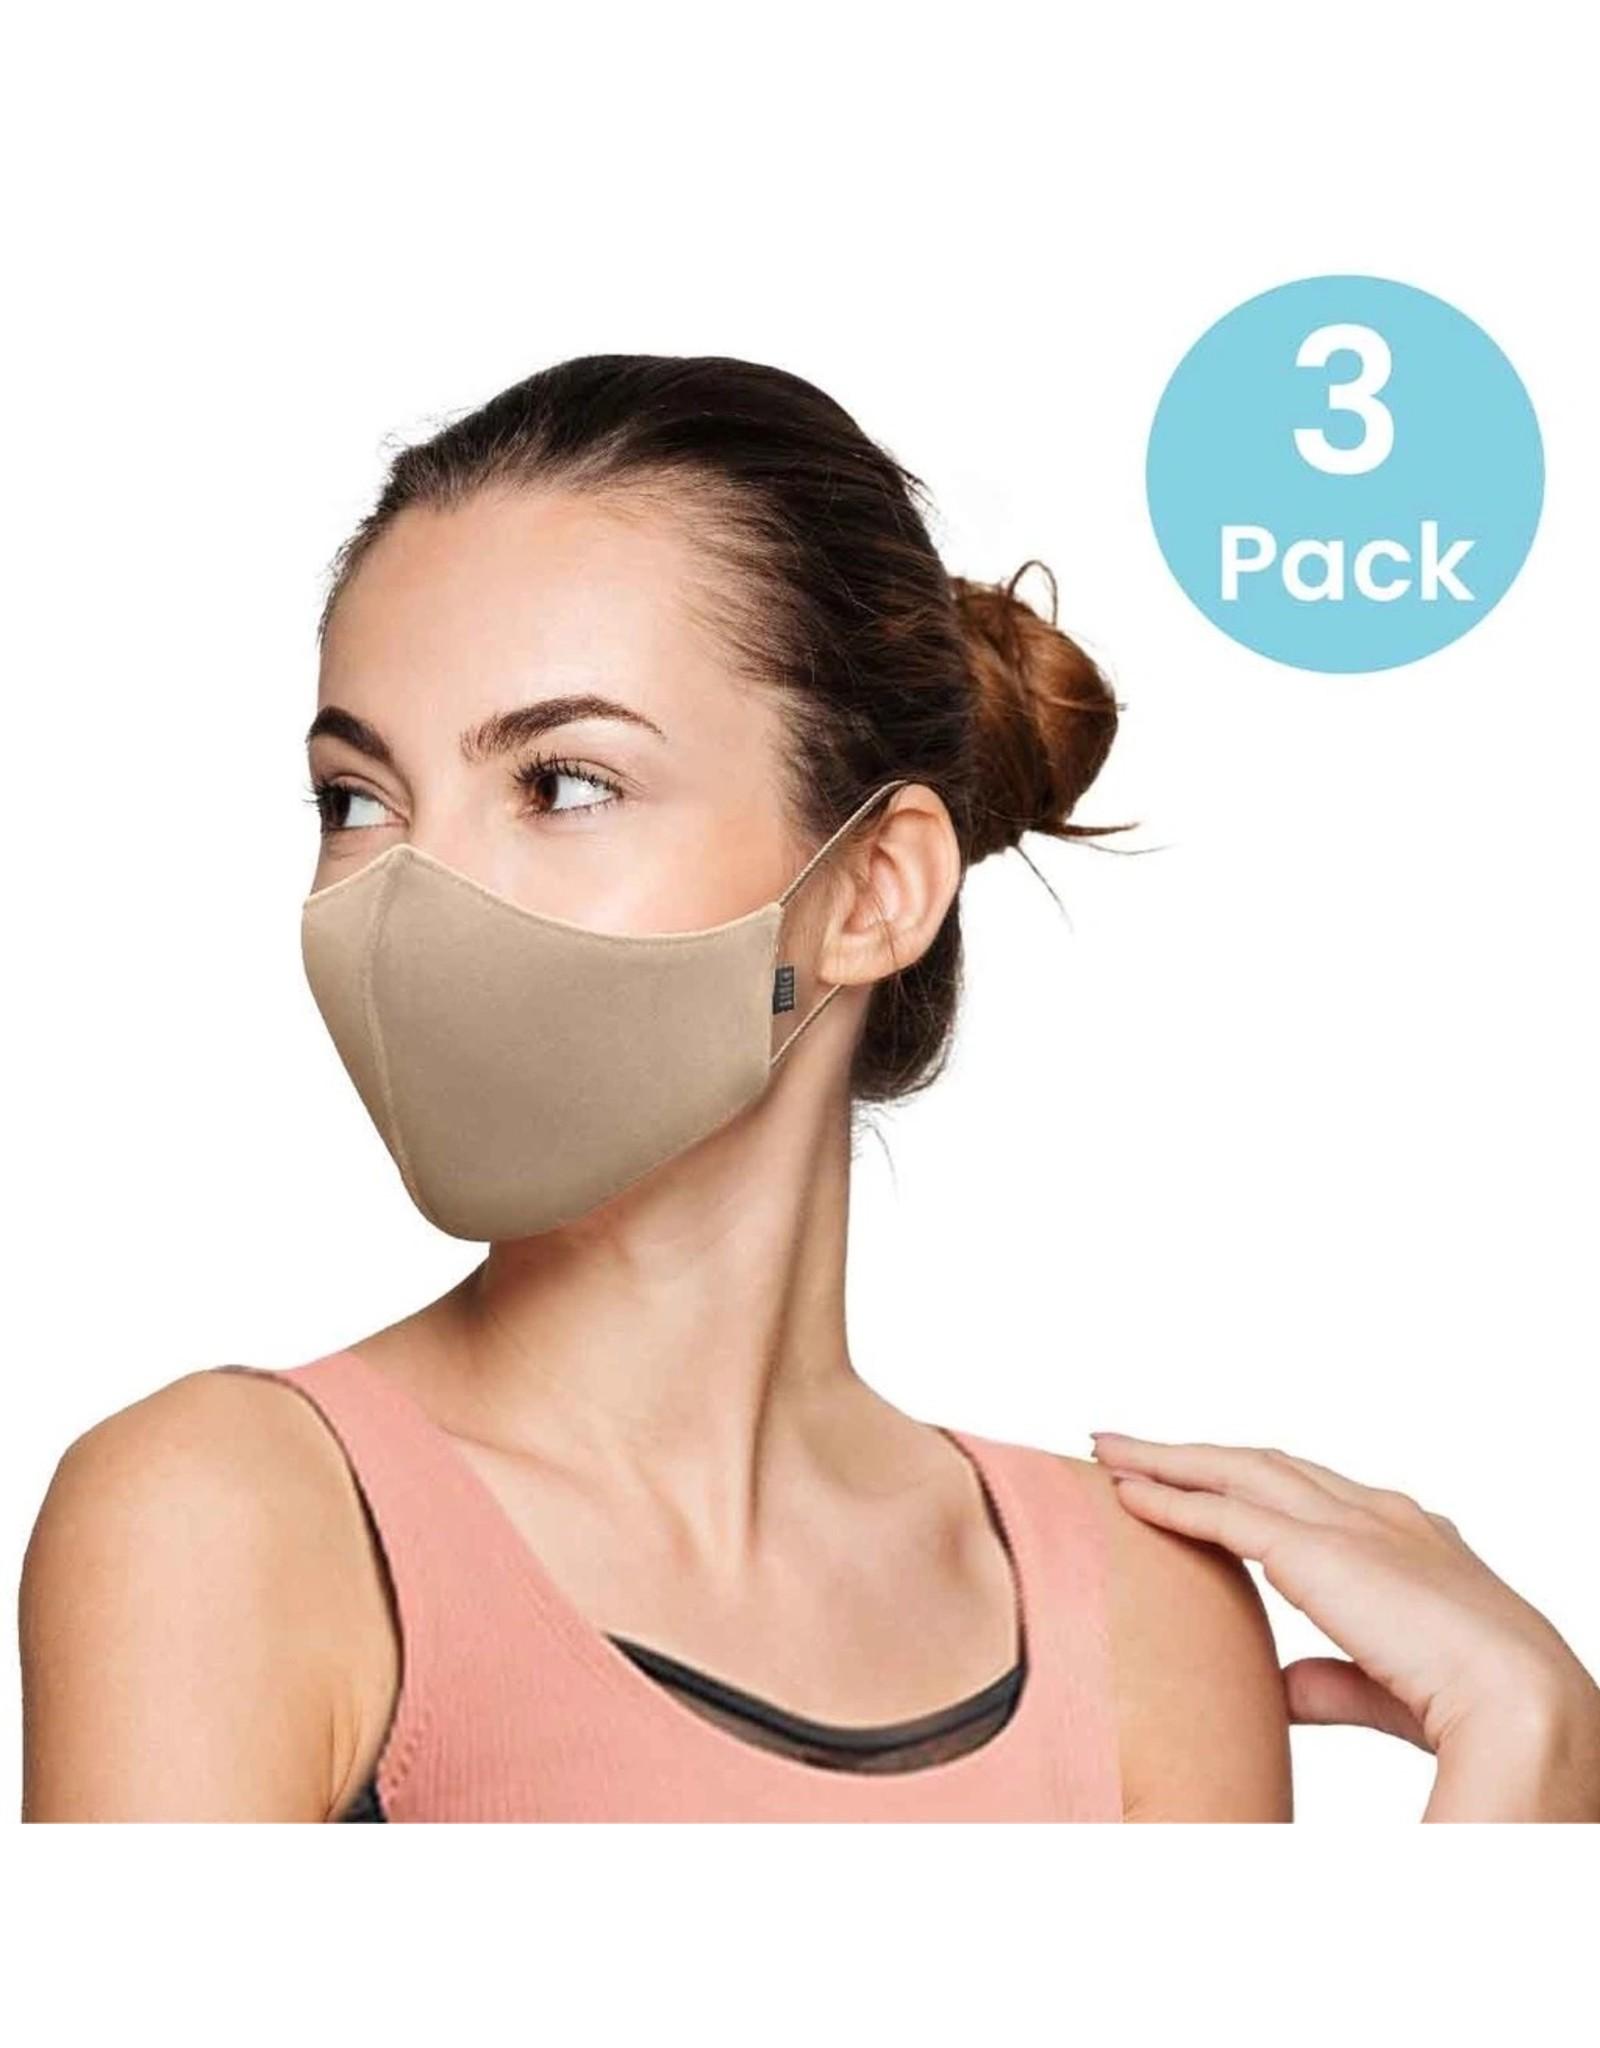 Bloch / Mirella Face Mask - 3 Pack (A001)